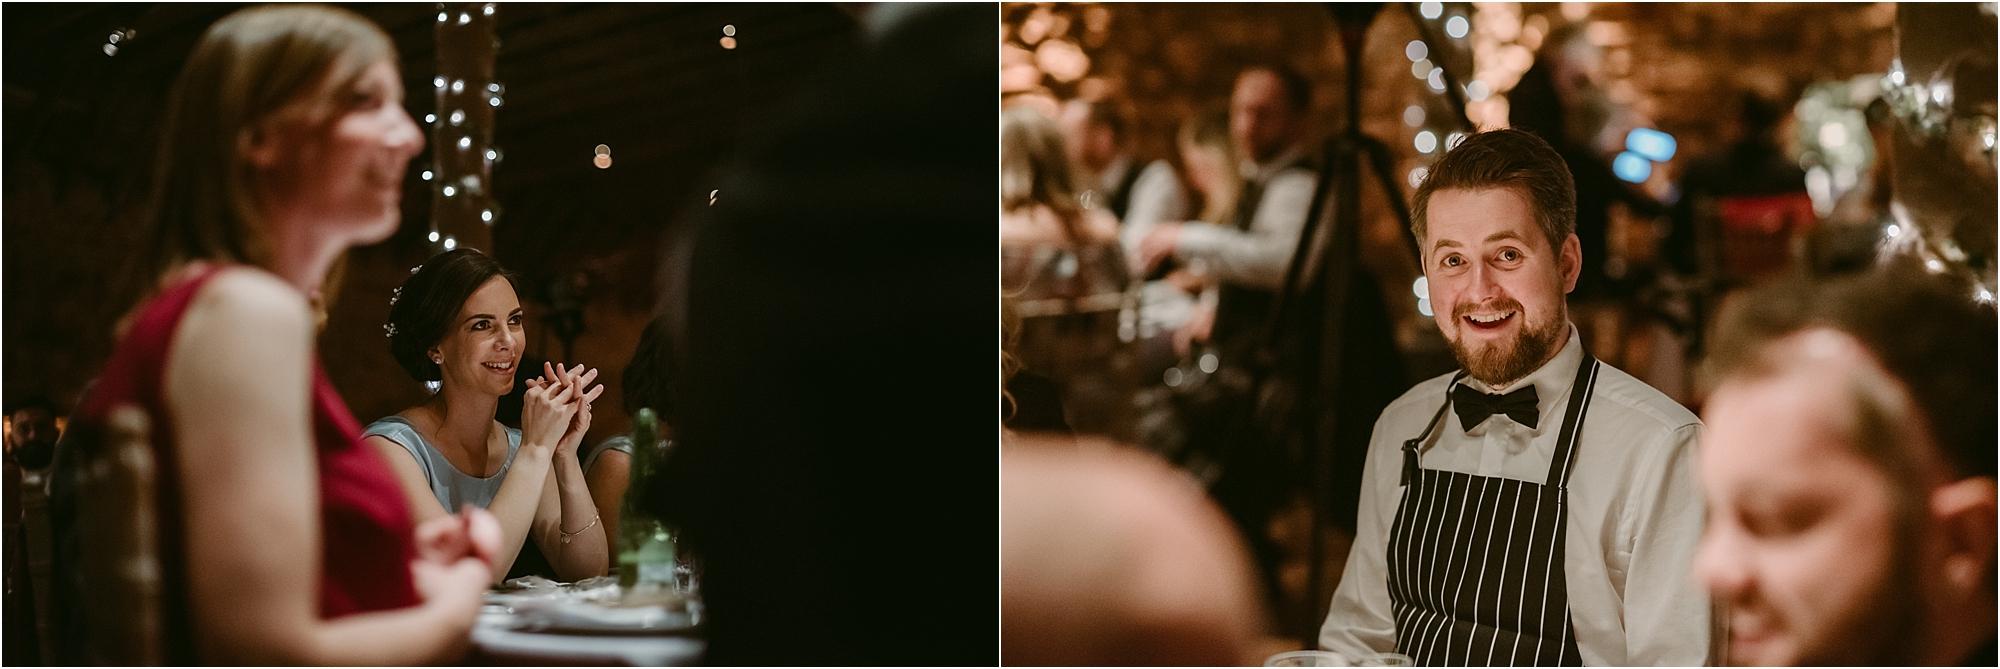 Scott+Joanna-Kinkell-Byre-wedding-fife-photography__0081.jpg